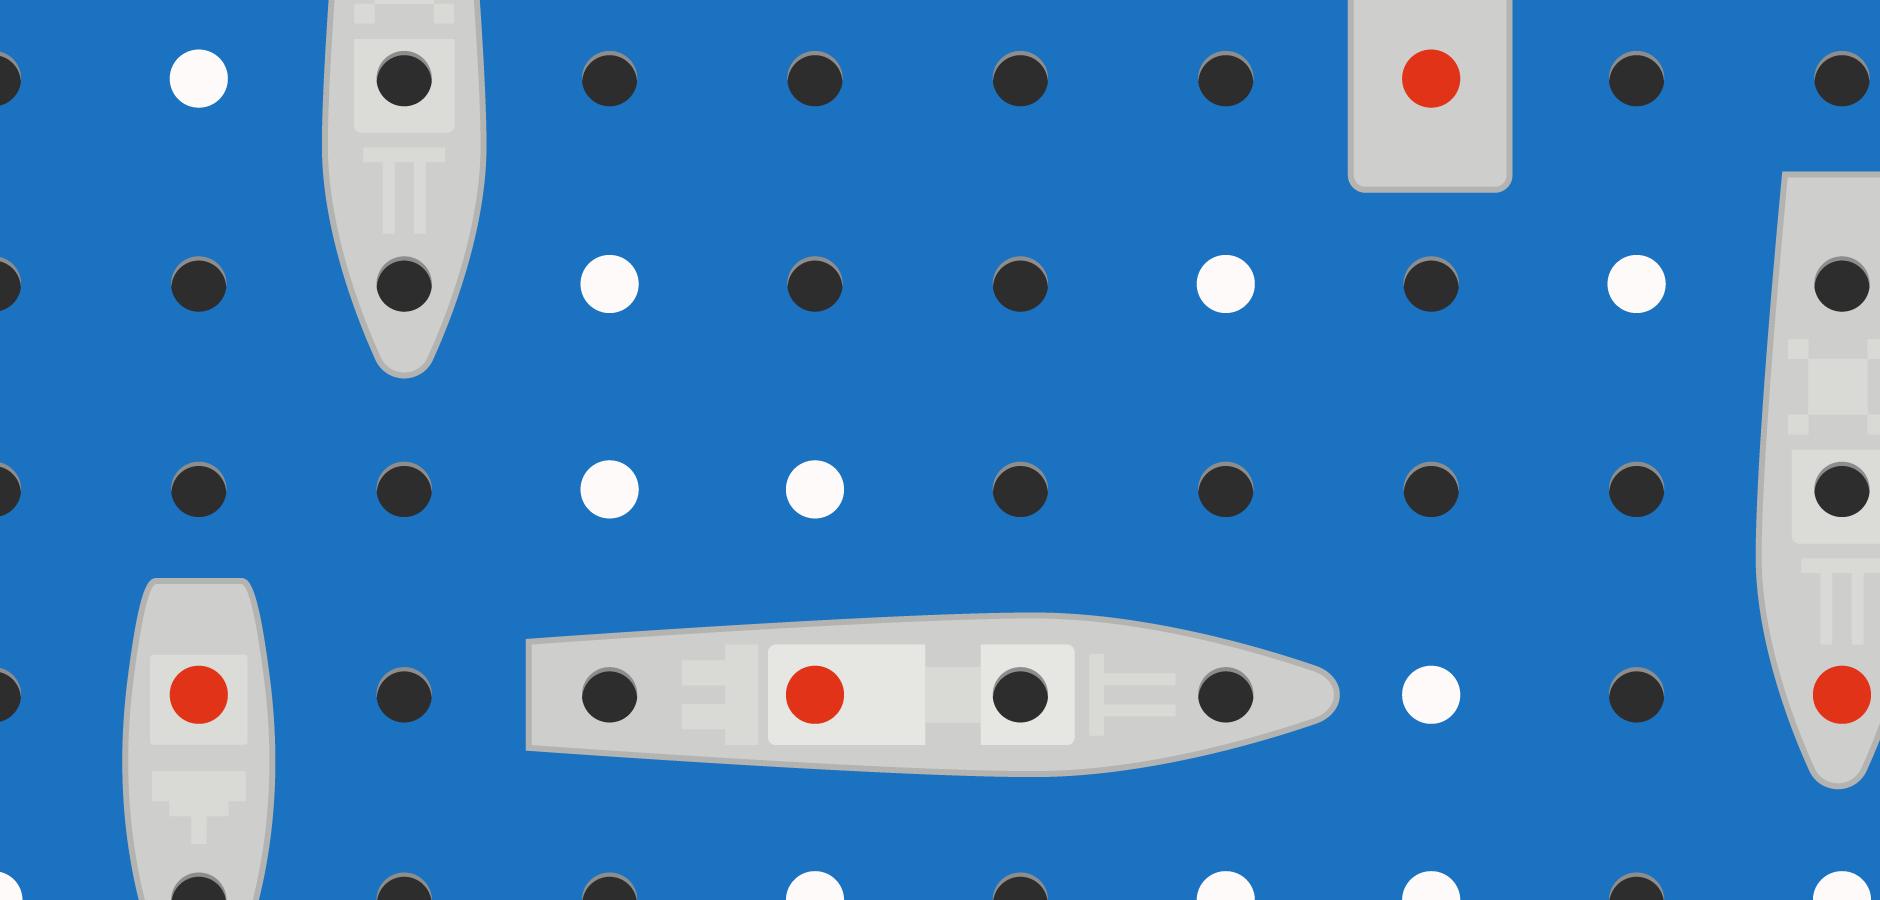 Dot Pixel - Illustration - Battleship